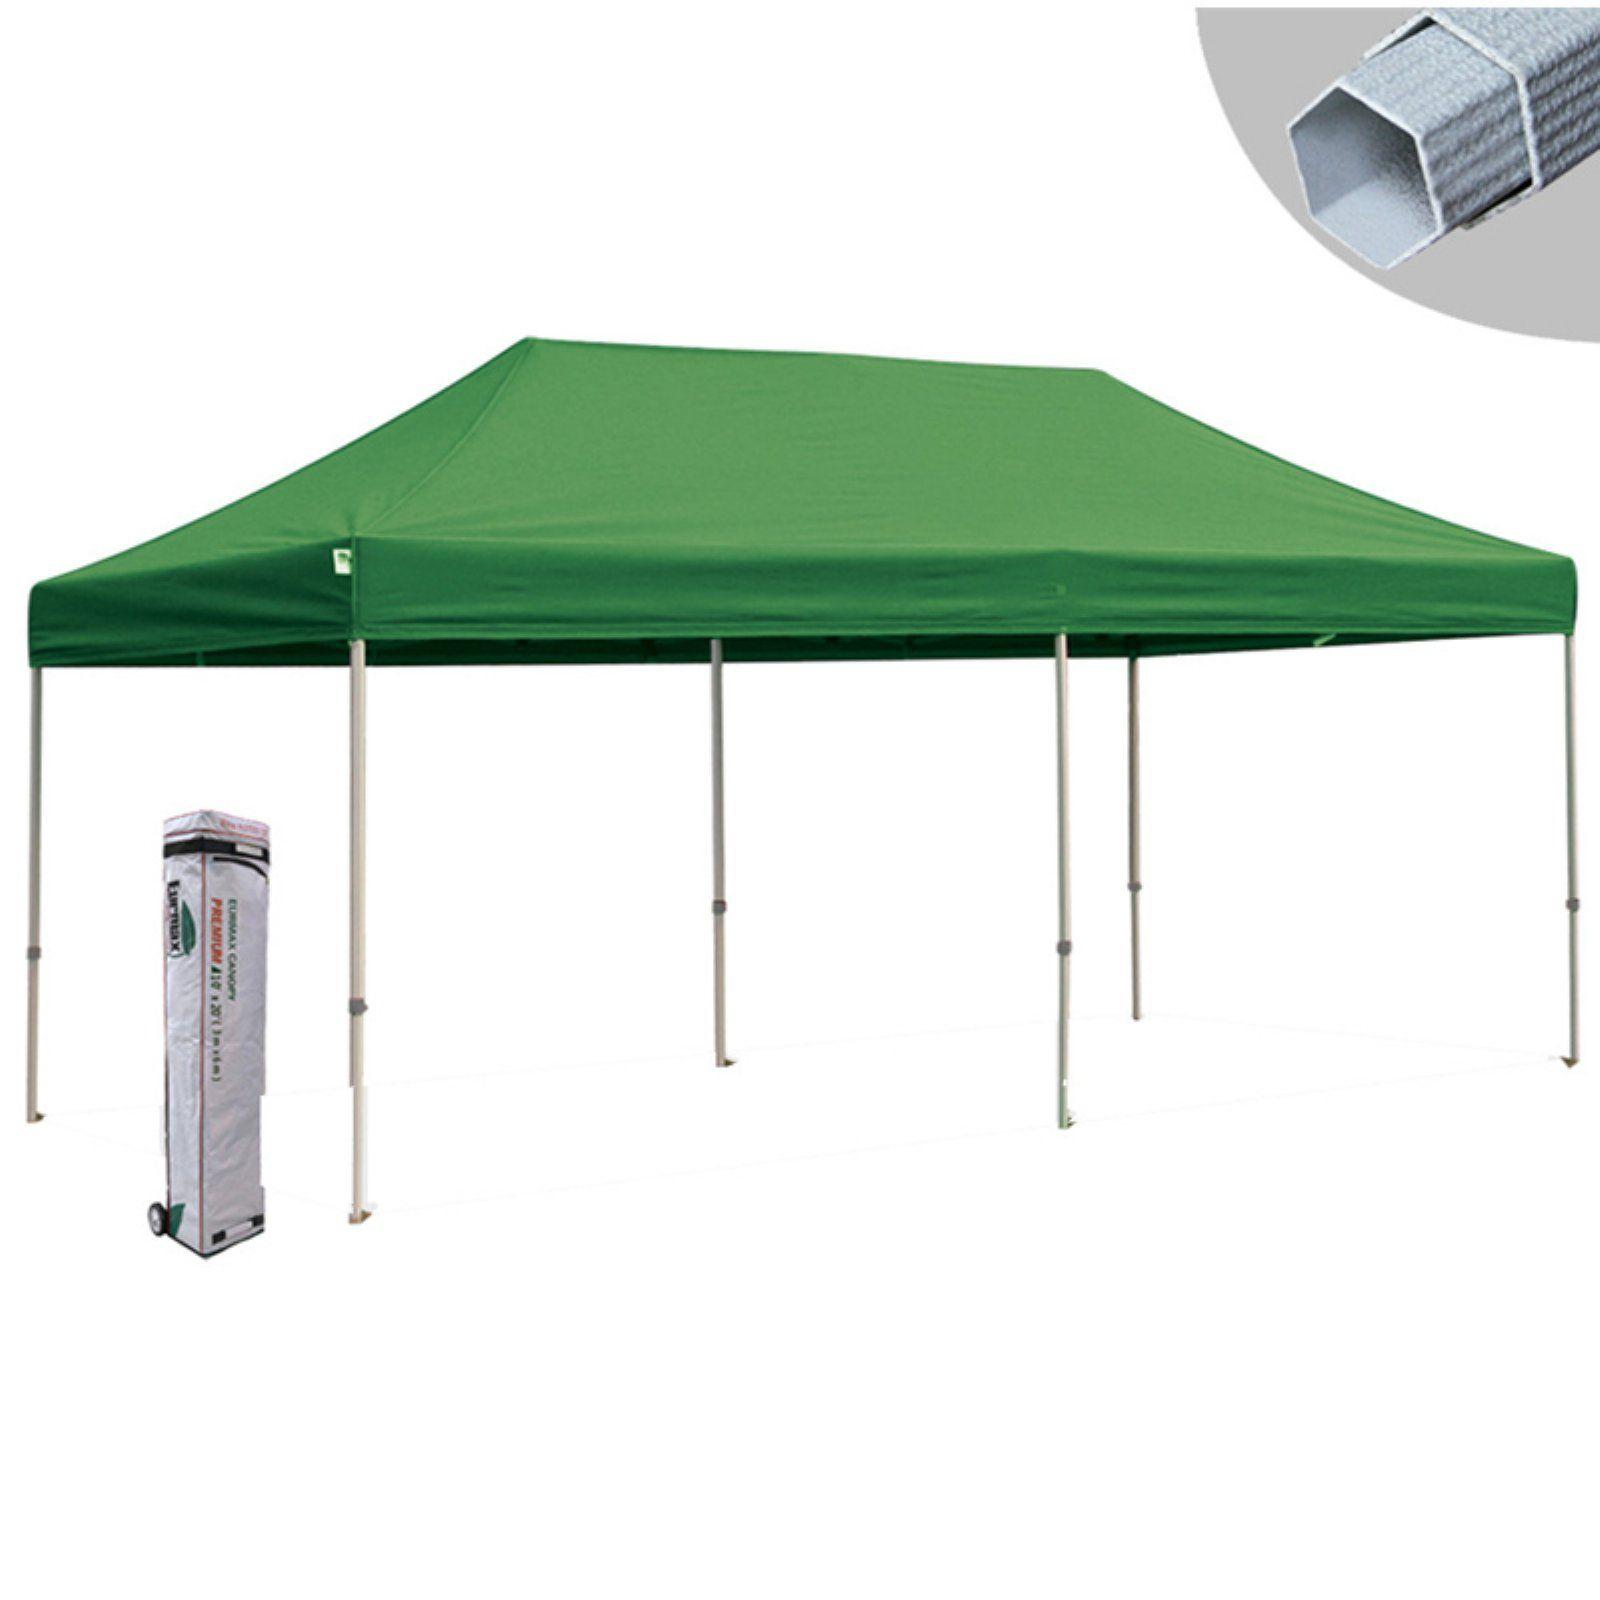 Eurmax Canopy Inc Premium 10 x 20 ft. PopUp Canopy Kelly